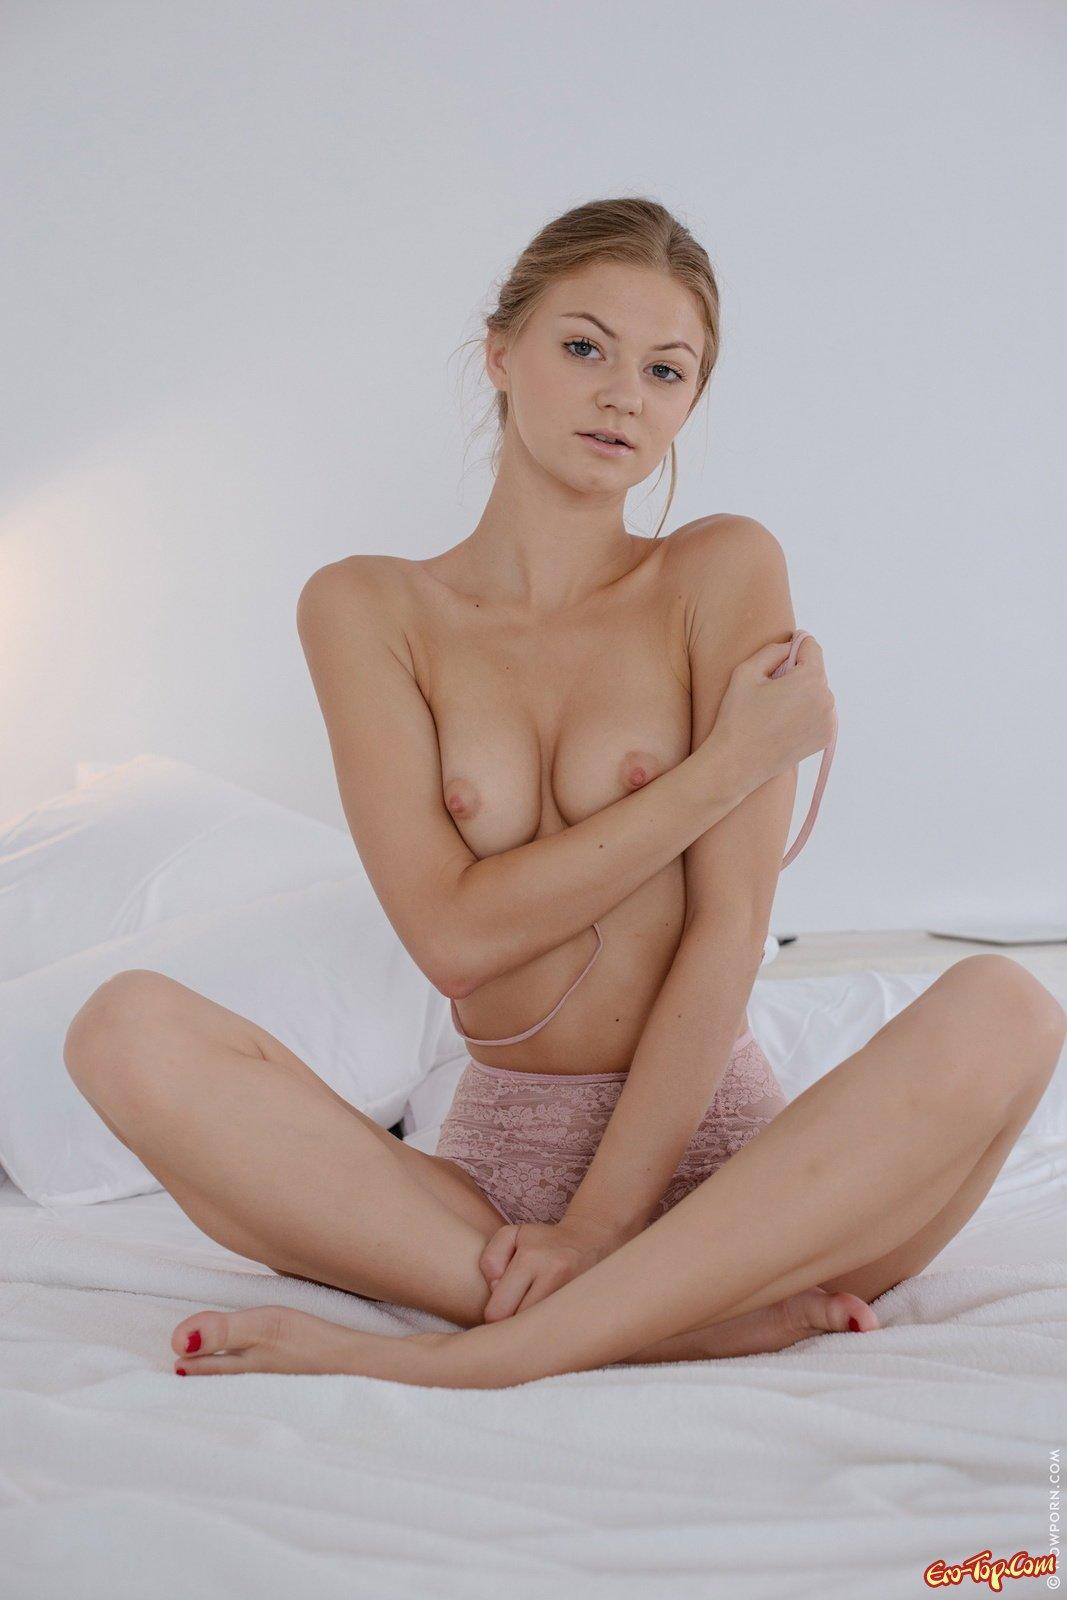 Светлая порноактриса сняла бикини засветив пизду в постели